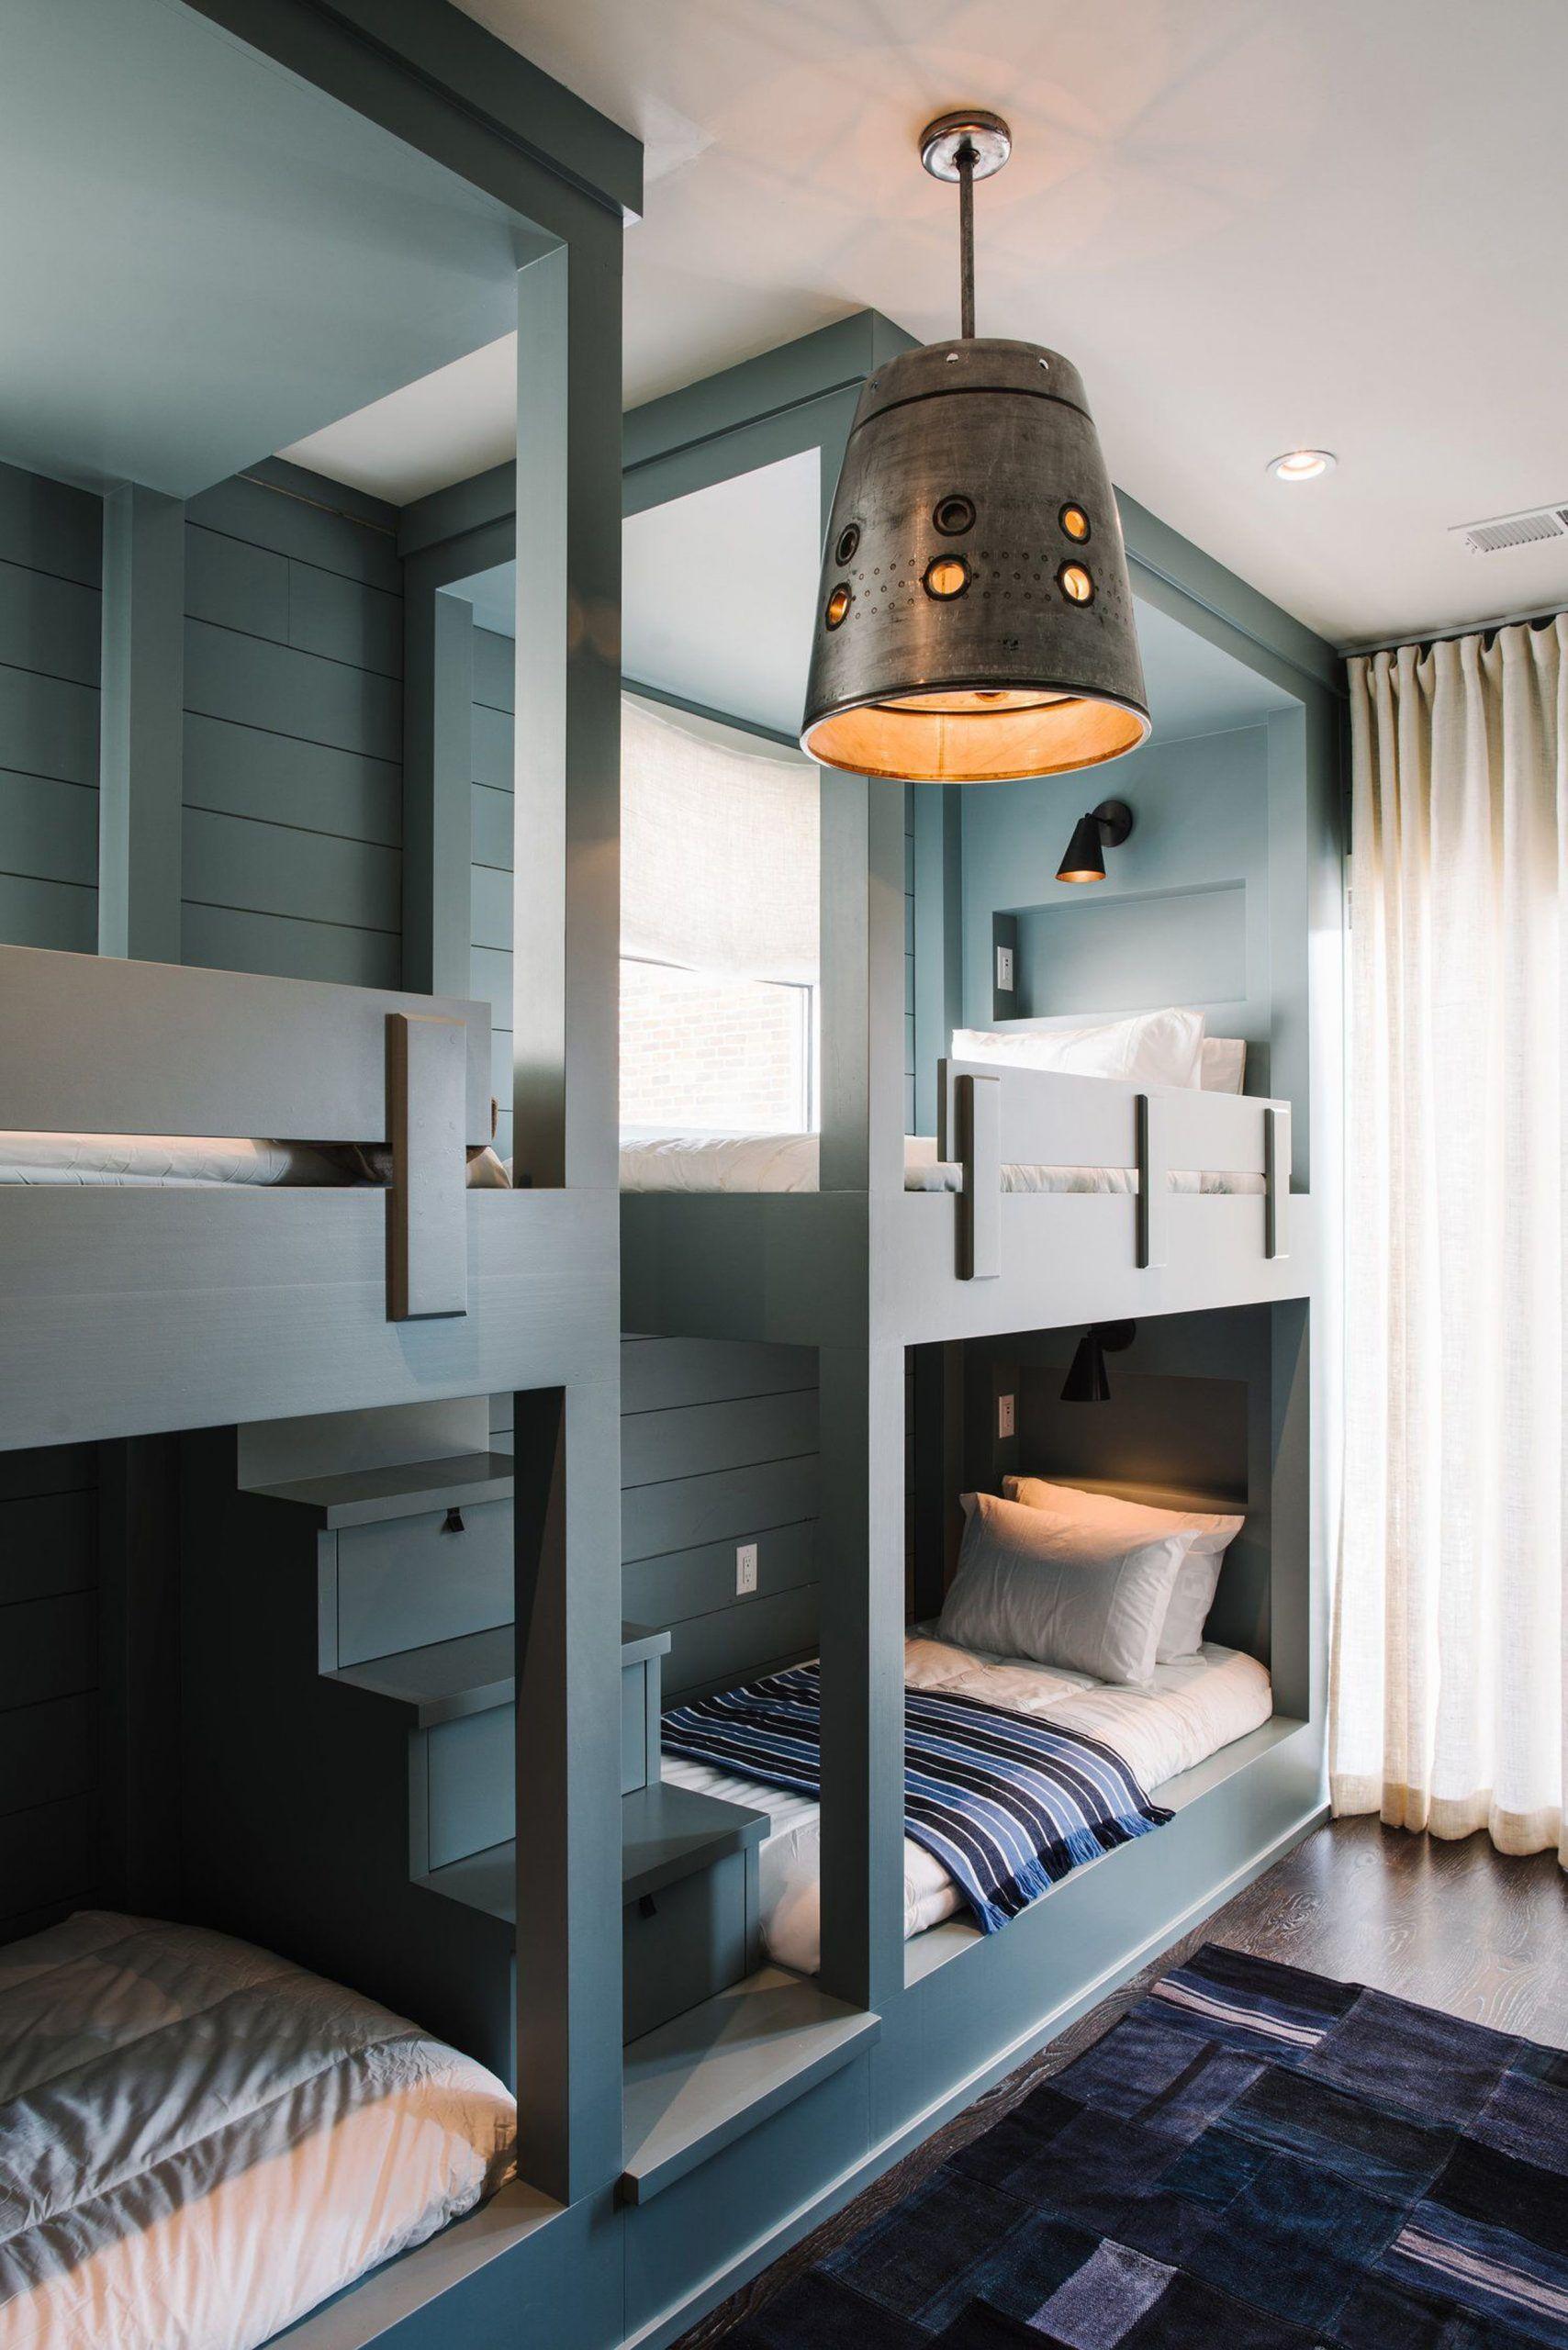 4 Bed Bunk Bed 2020 in 2020 Bunk beds built in, Built in